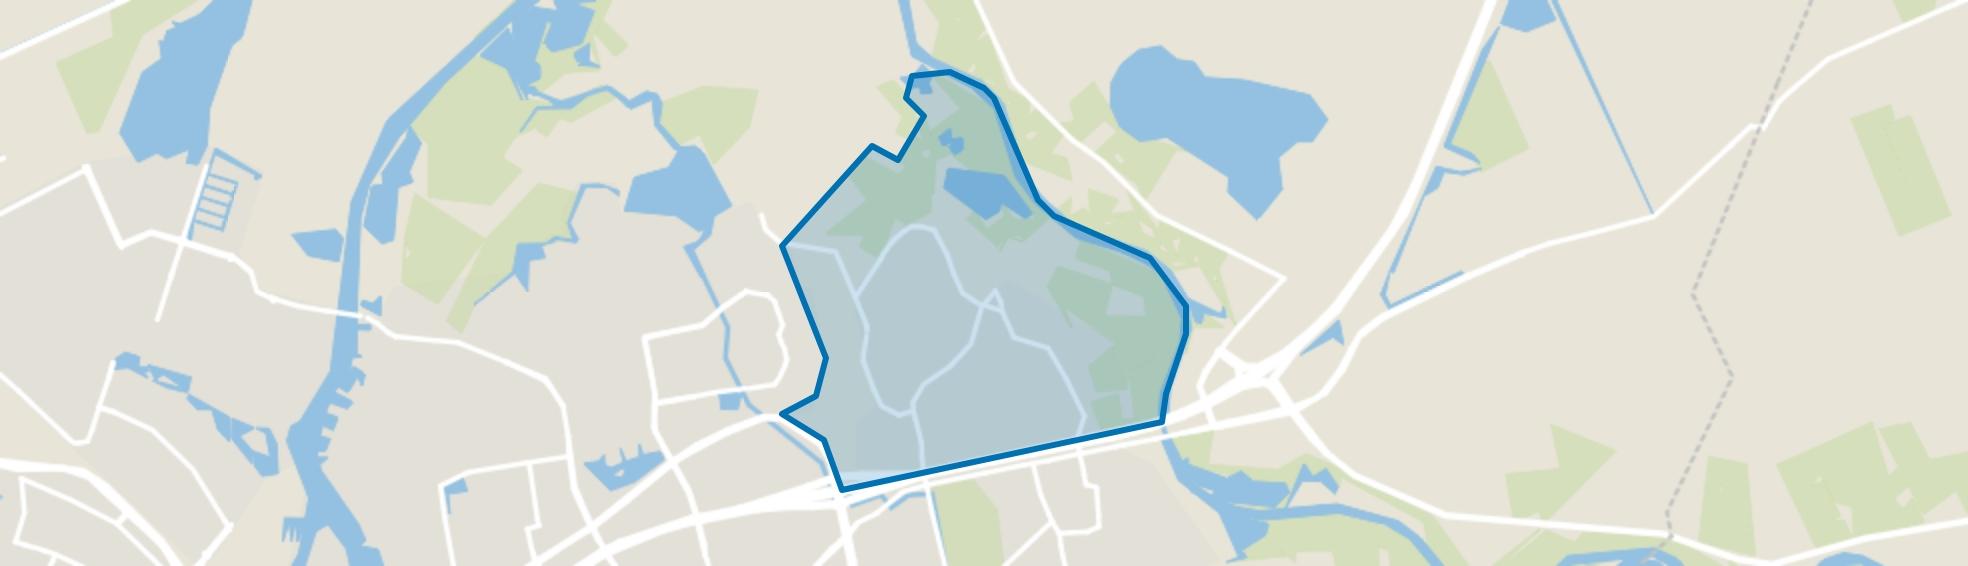 Brinkhoek, Zwolle map